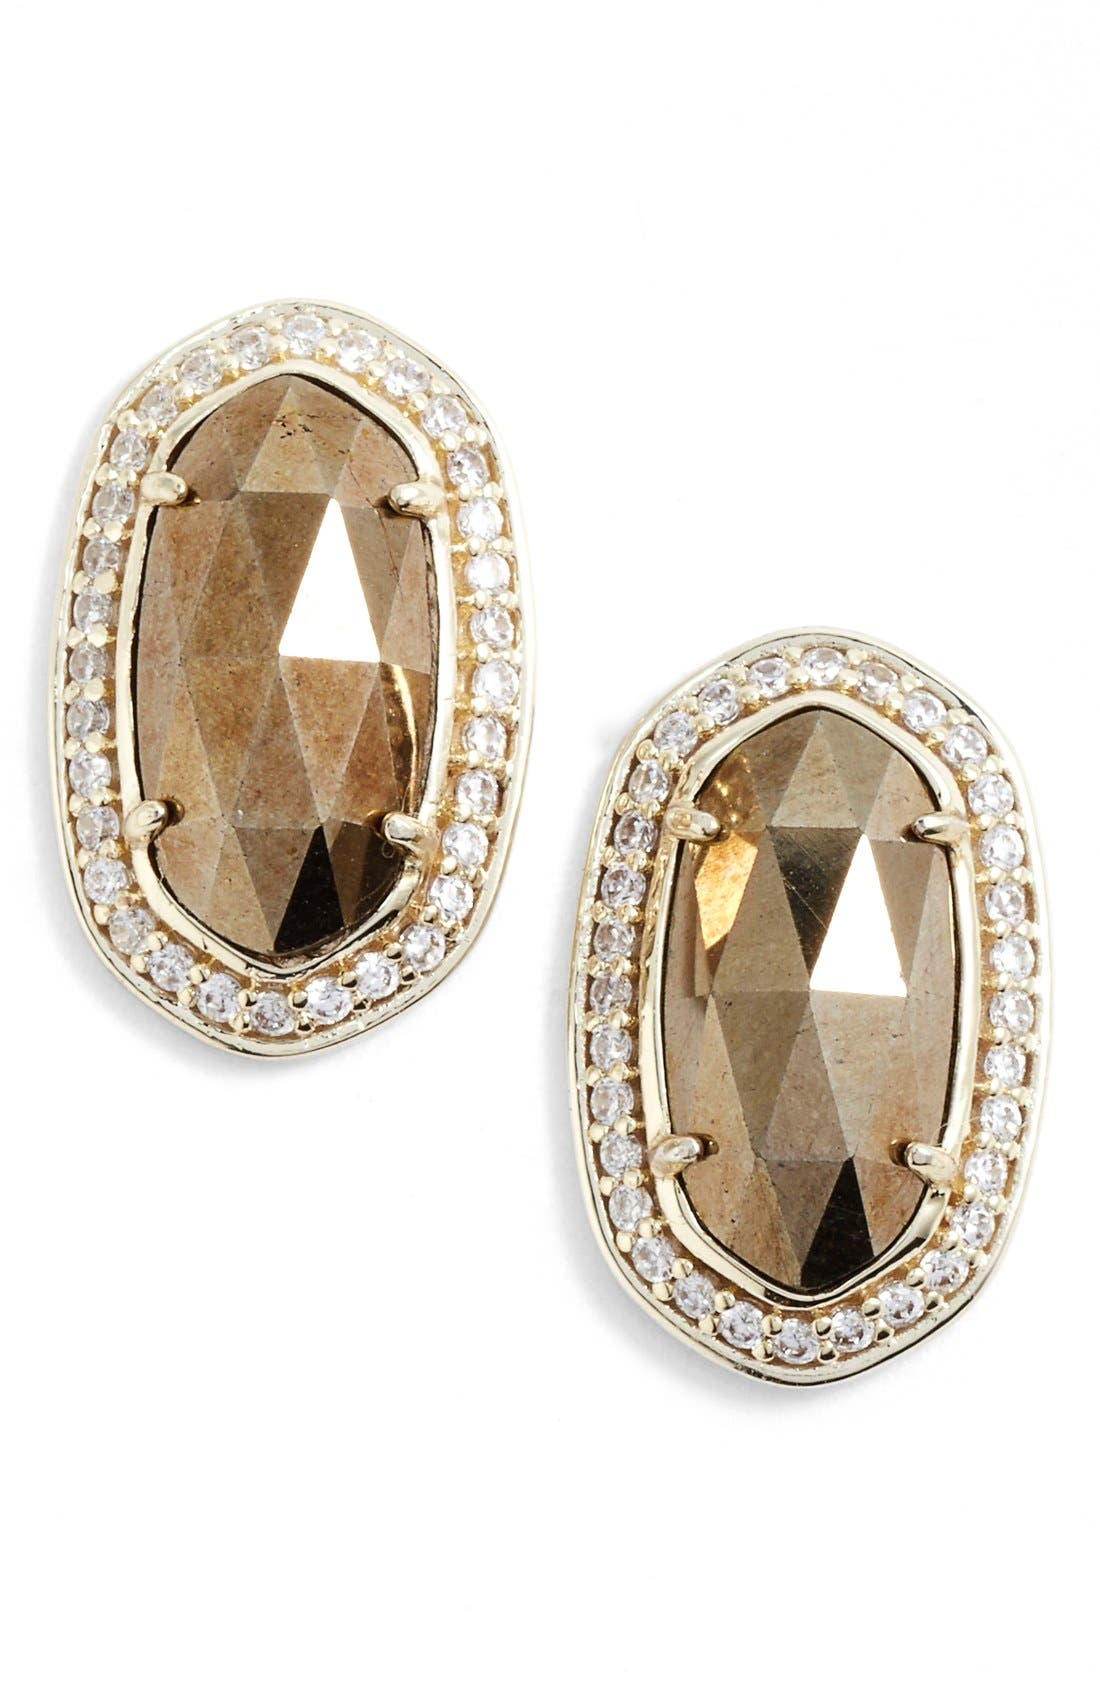 Main Image - Kendra Scott 'Elaine' Stud Earrings